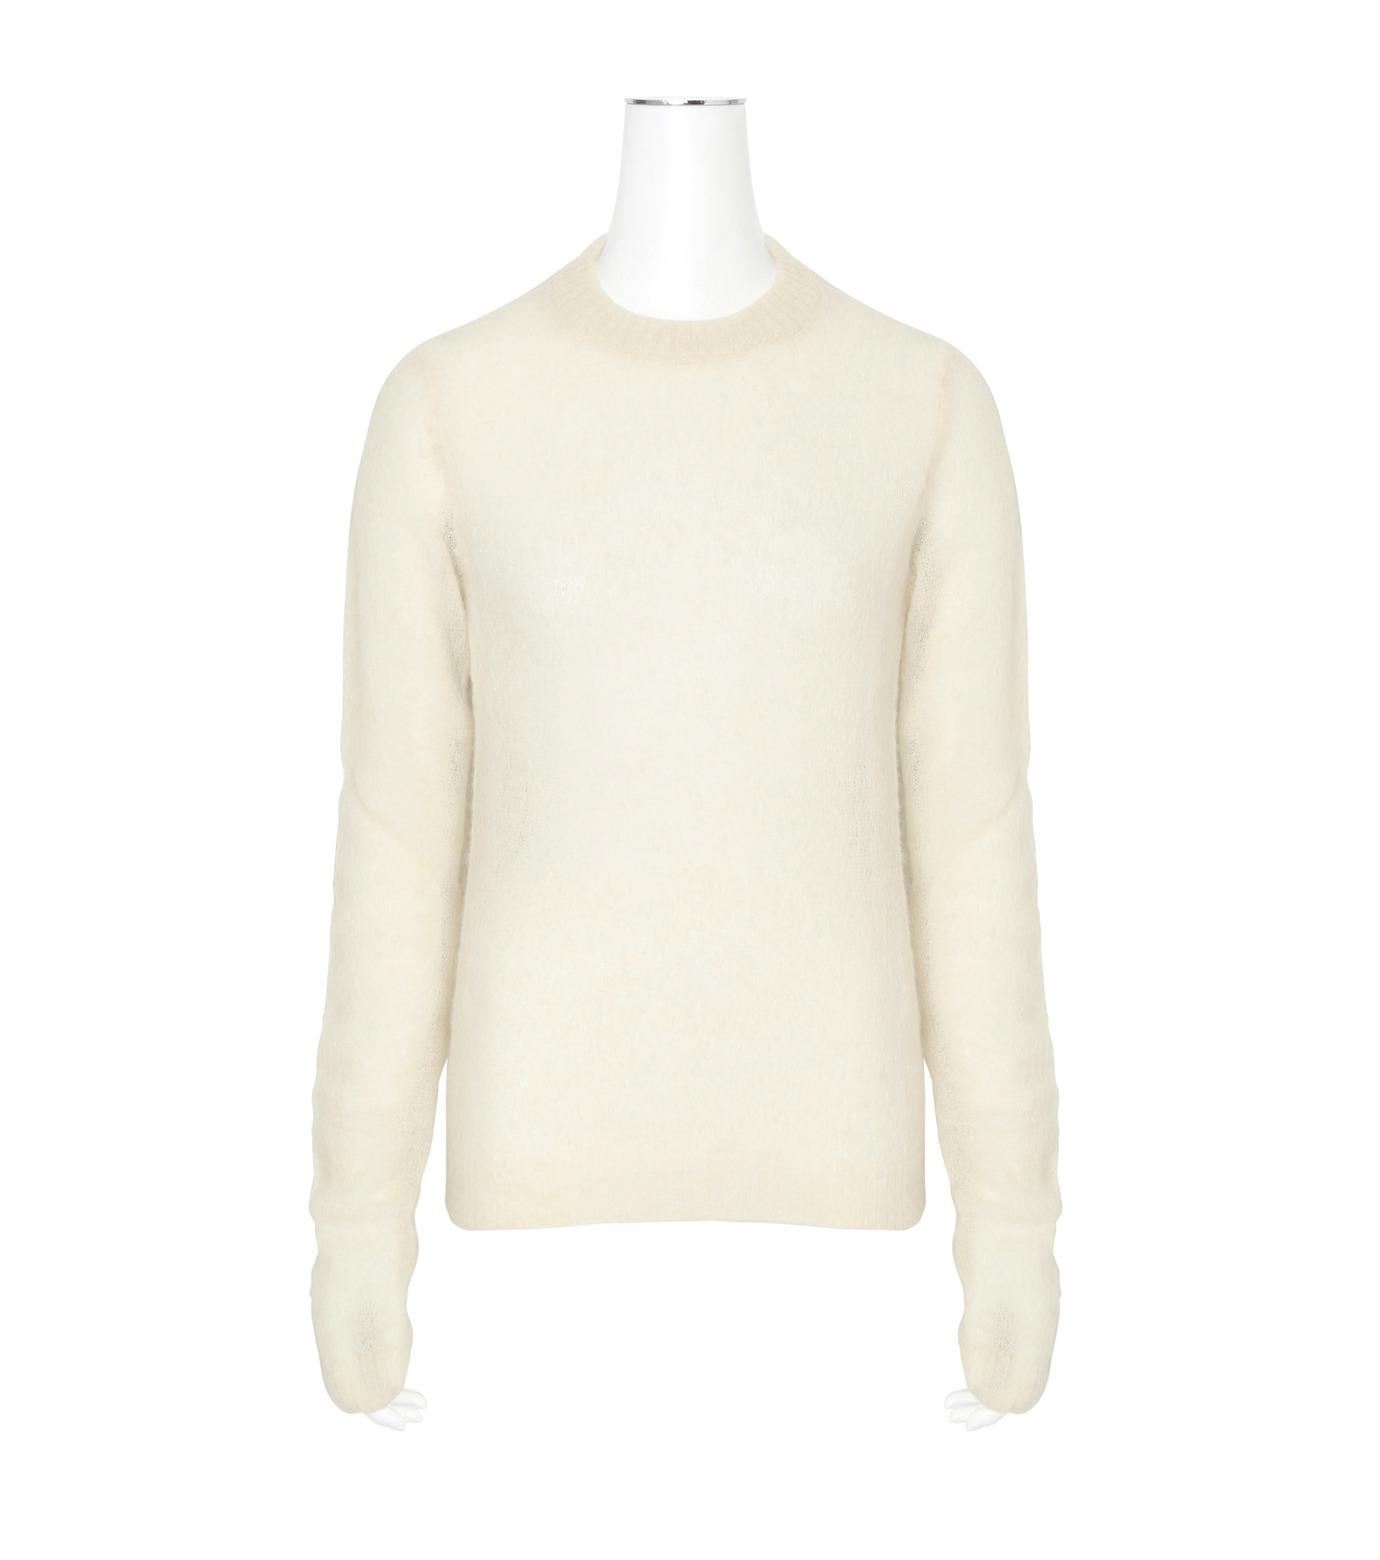 ACNE STUDIOS(アクネ ストゥディオズ)のAlpaca Extra LS Pullover-WHITE(ニット/knit)-19F166-5 拡大詳細画像1